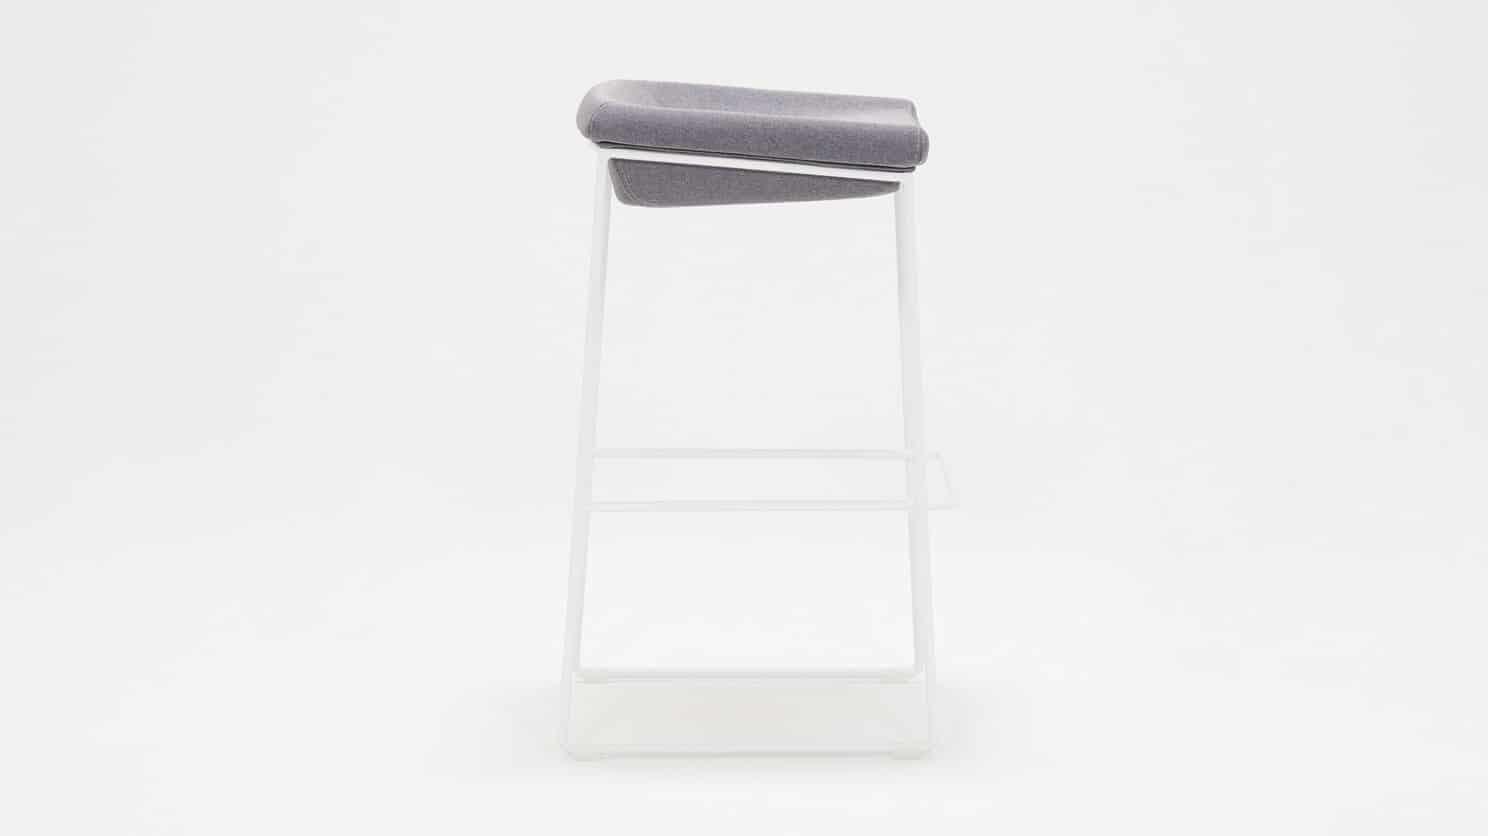 3020 266 par 8 counter chairs mackenzie bar stool light grey seat white base side 01